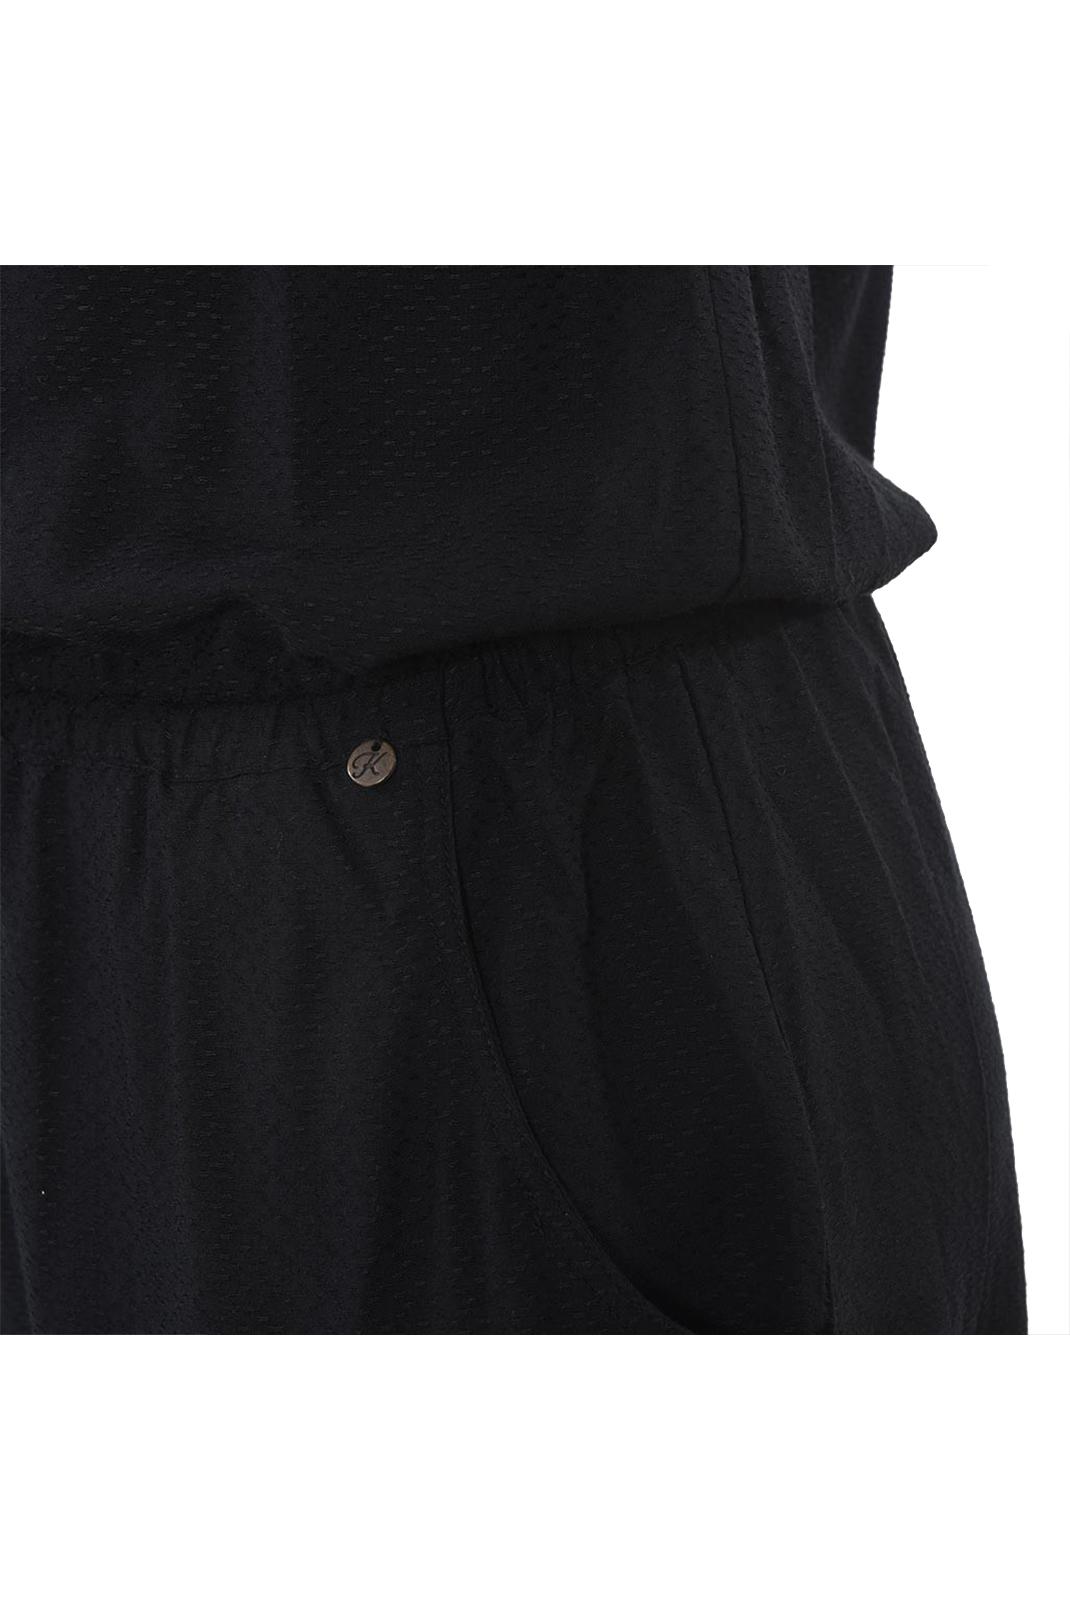 Shorts  Kaporal MISSY BLACK